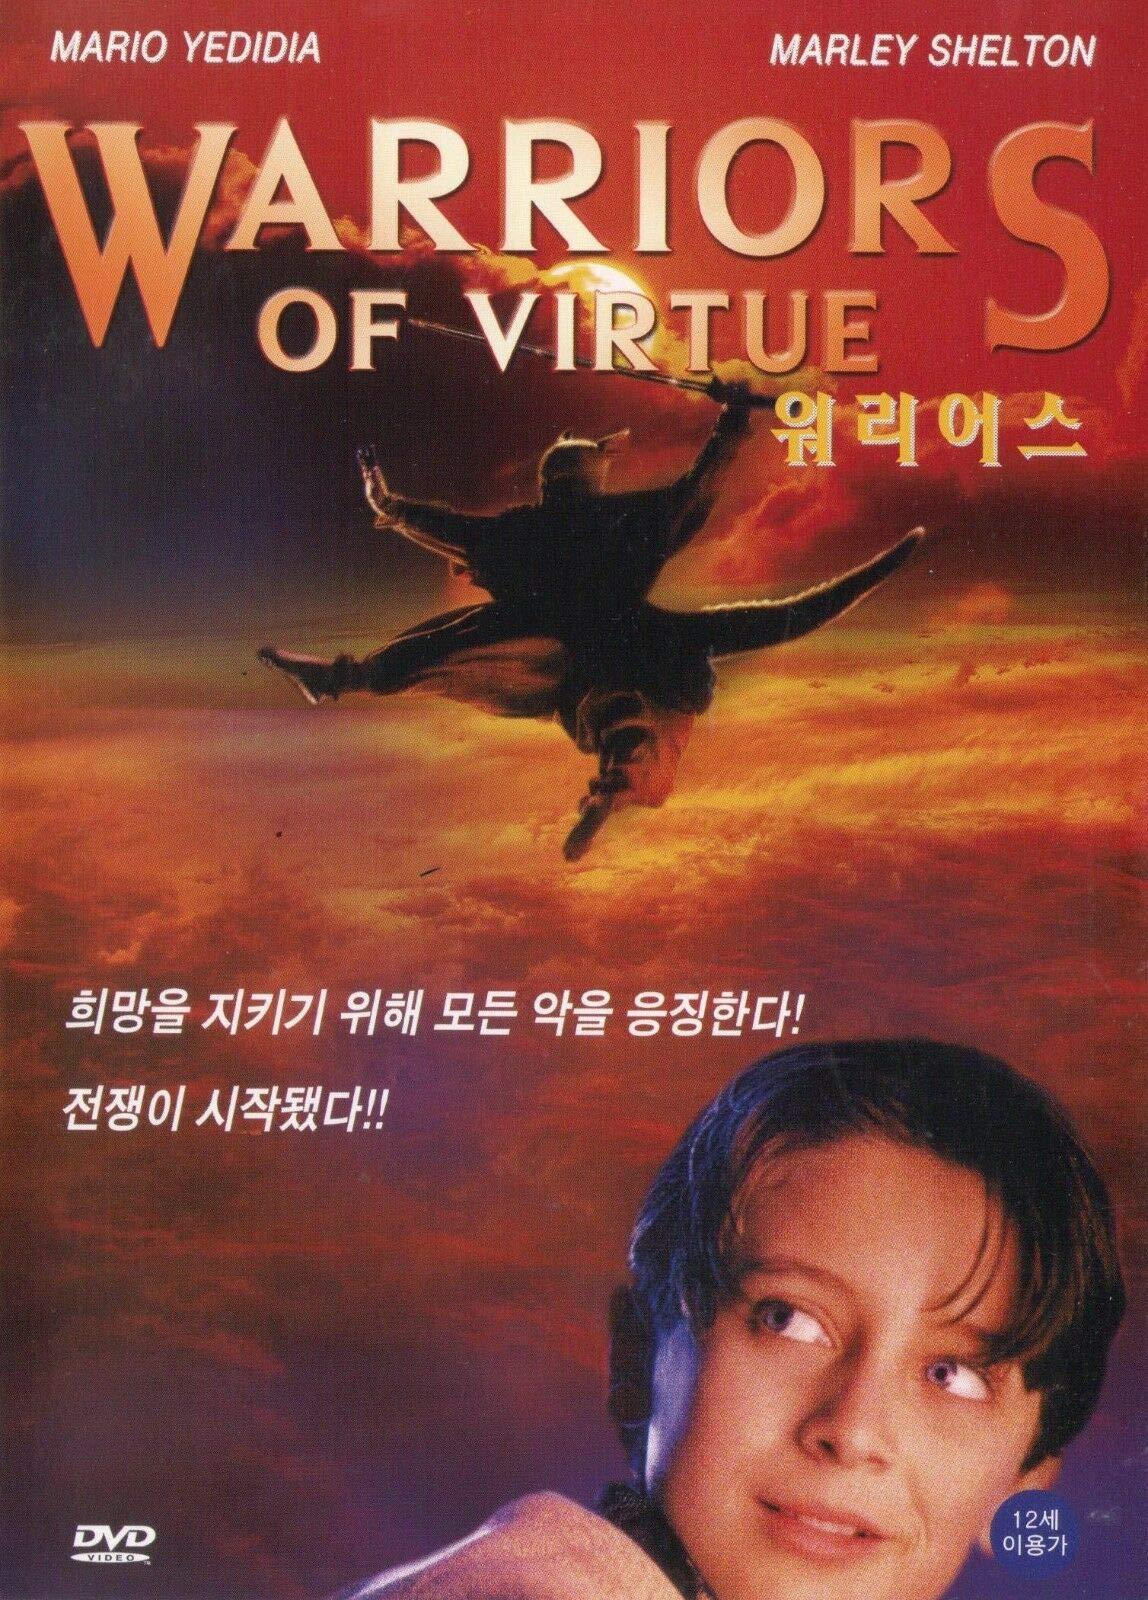 Warriors of Virtue (1997) DVD Angus Macfadyen by 474 (Image #1)